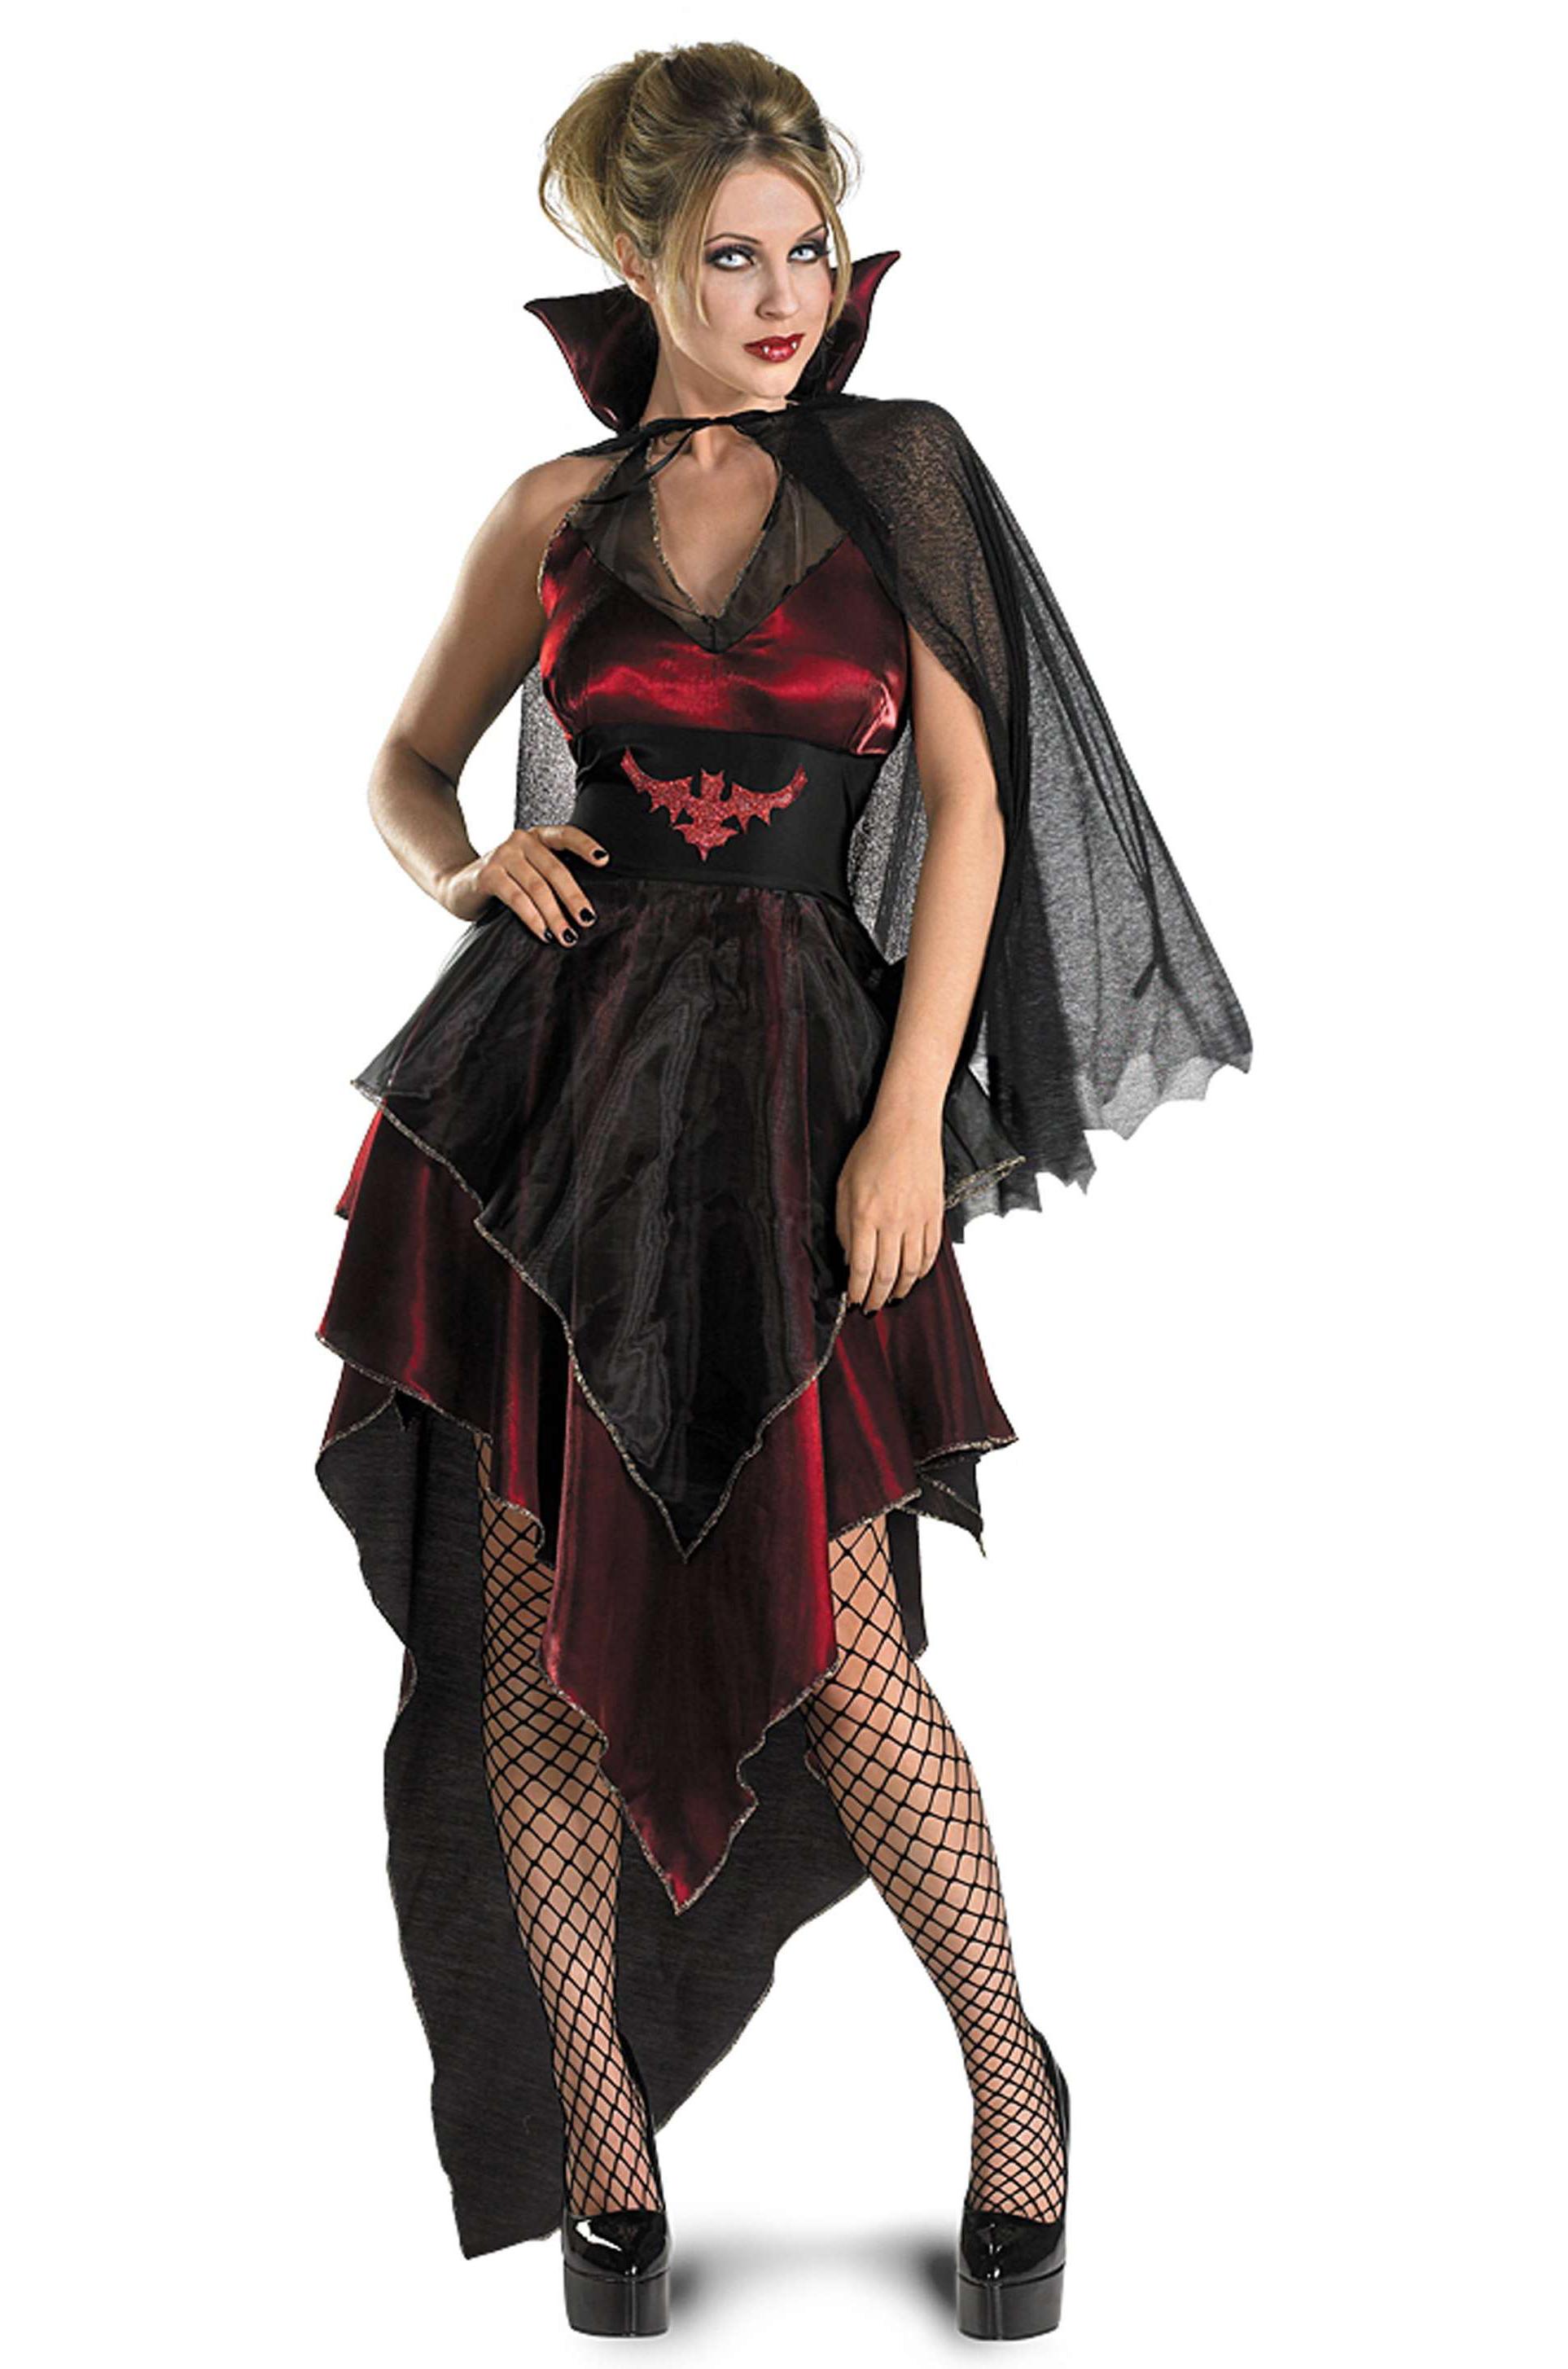 Costume - HD1926×2909